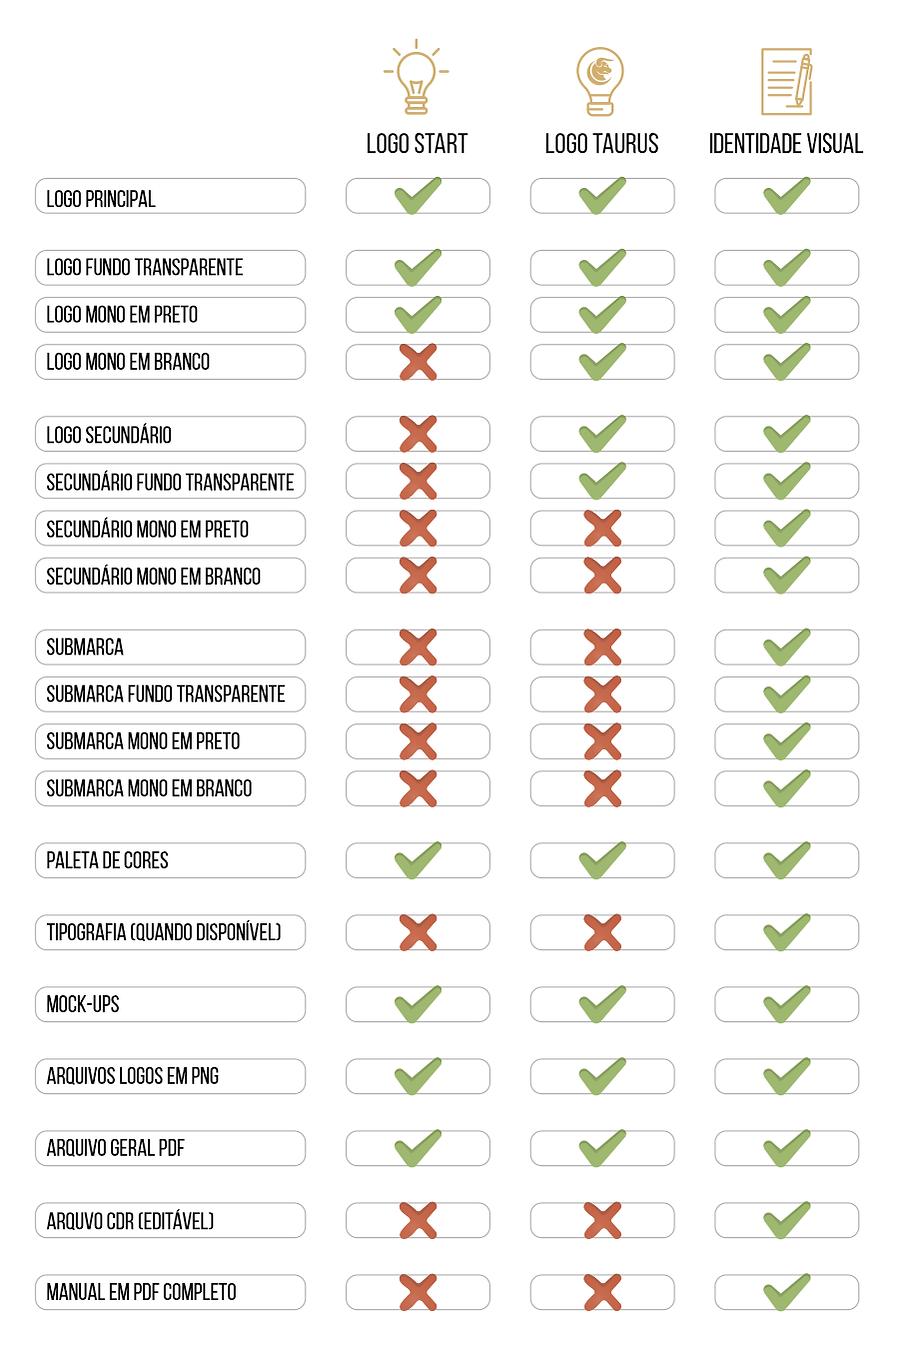 Comparativo Identidade Visual Agência Nandi